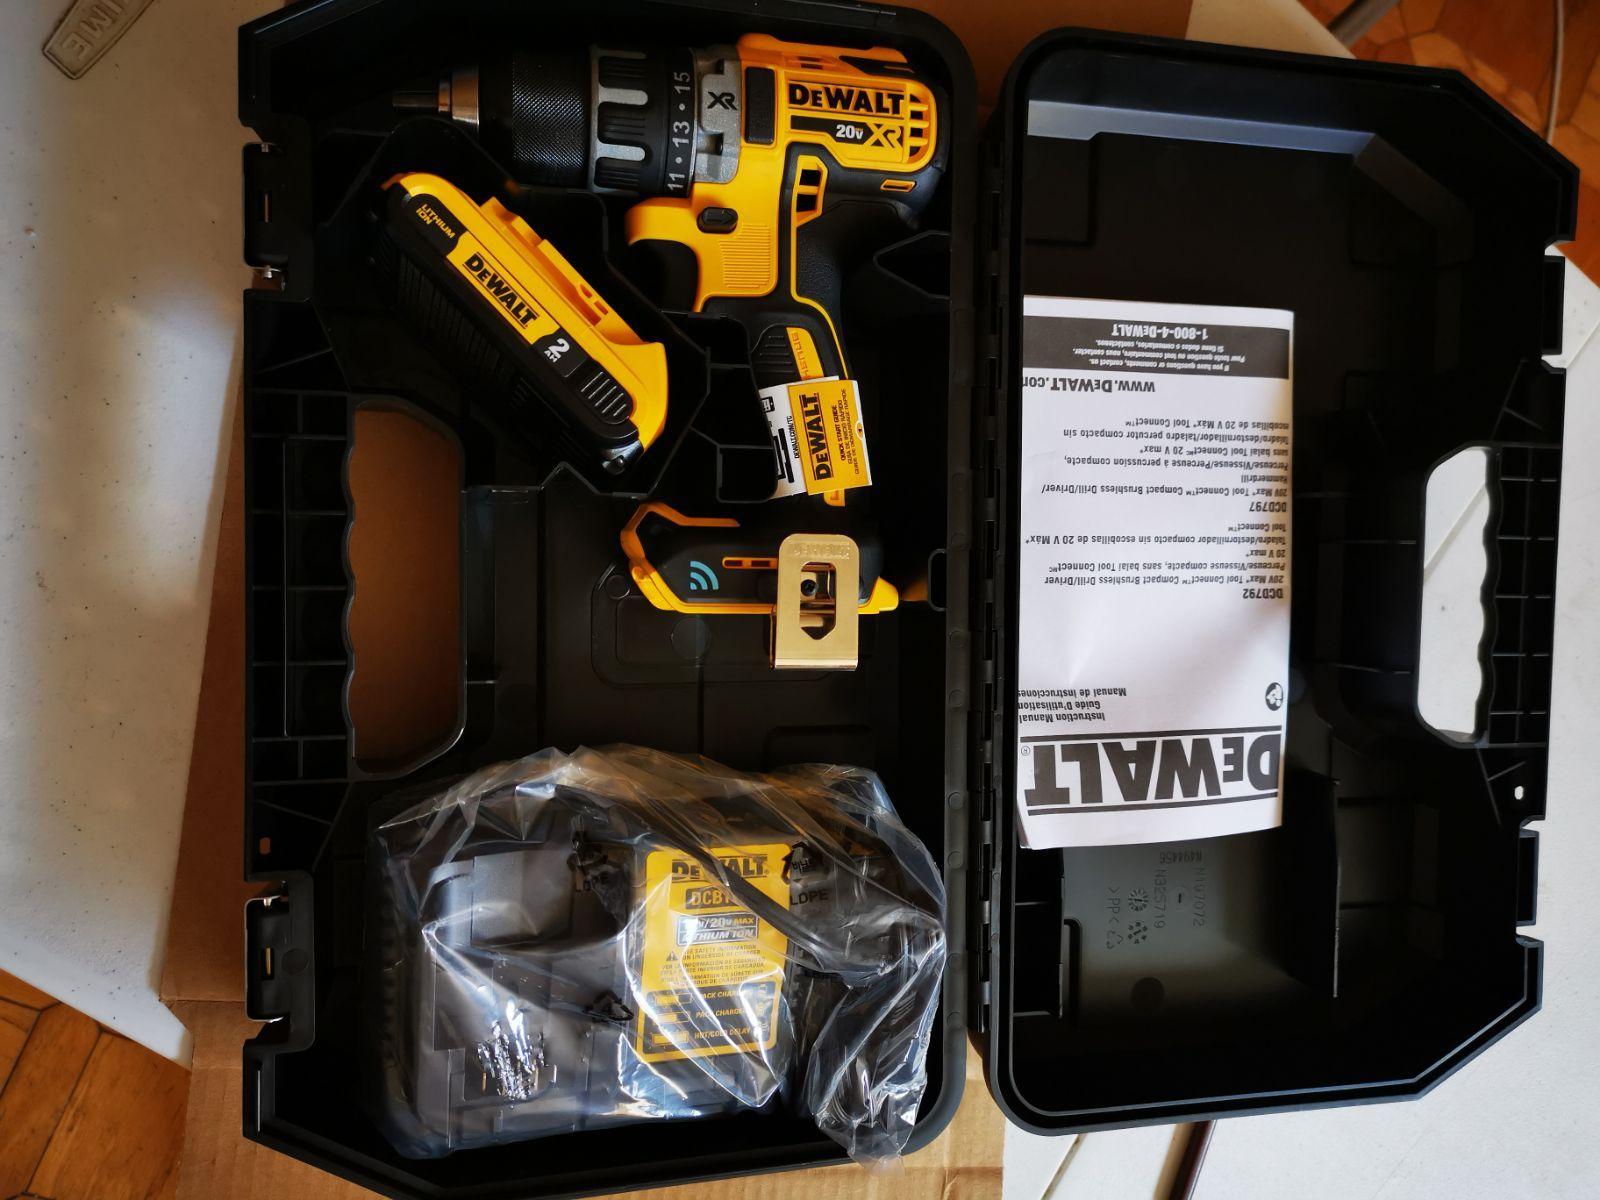 Include One Battery One Charger And Hard Case Brand New Dewalt Tools Dewar Dewalt